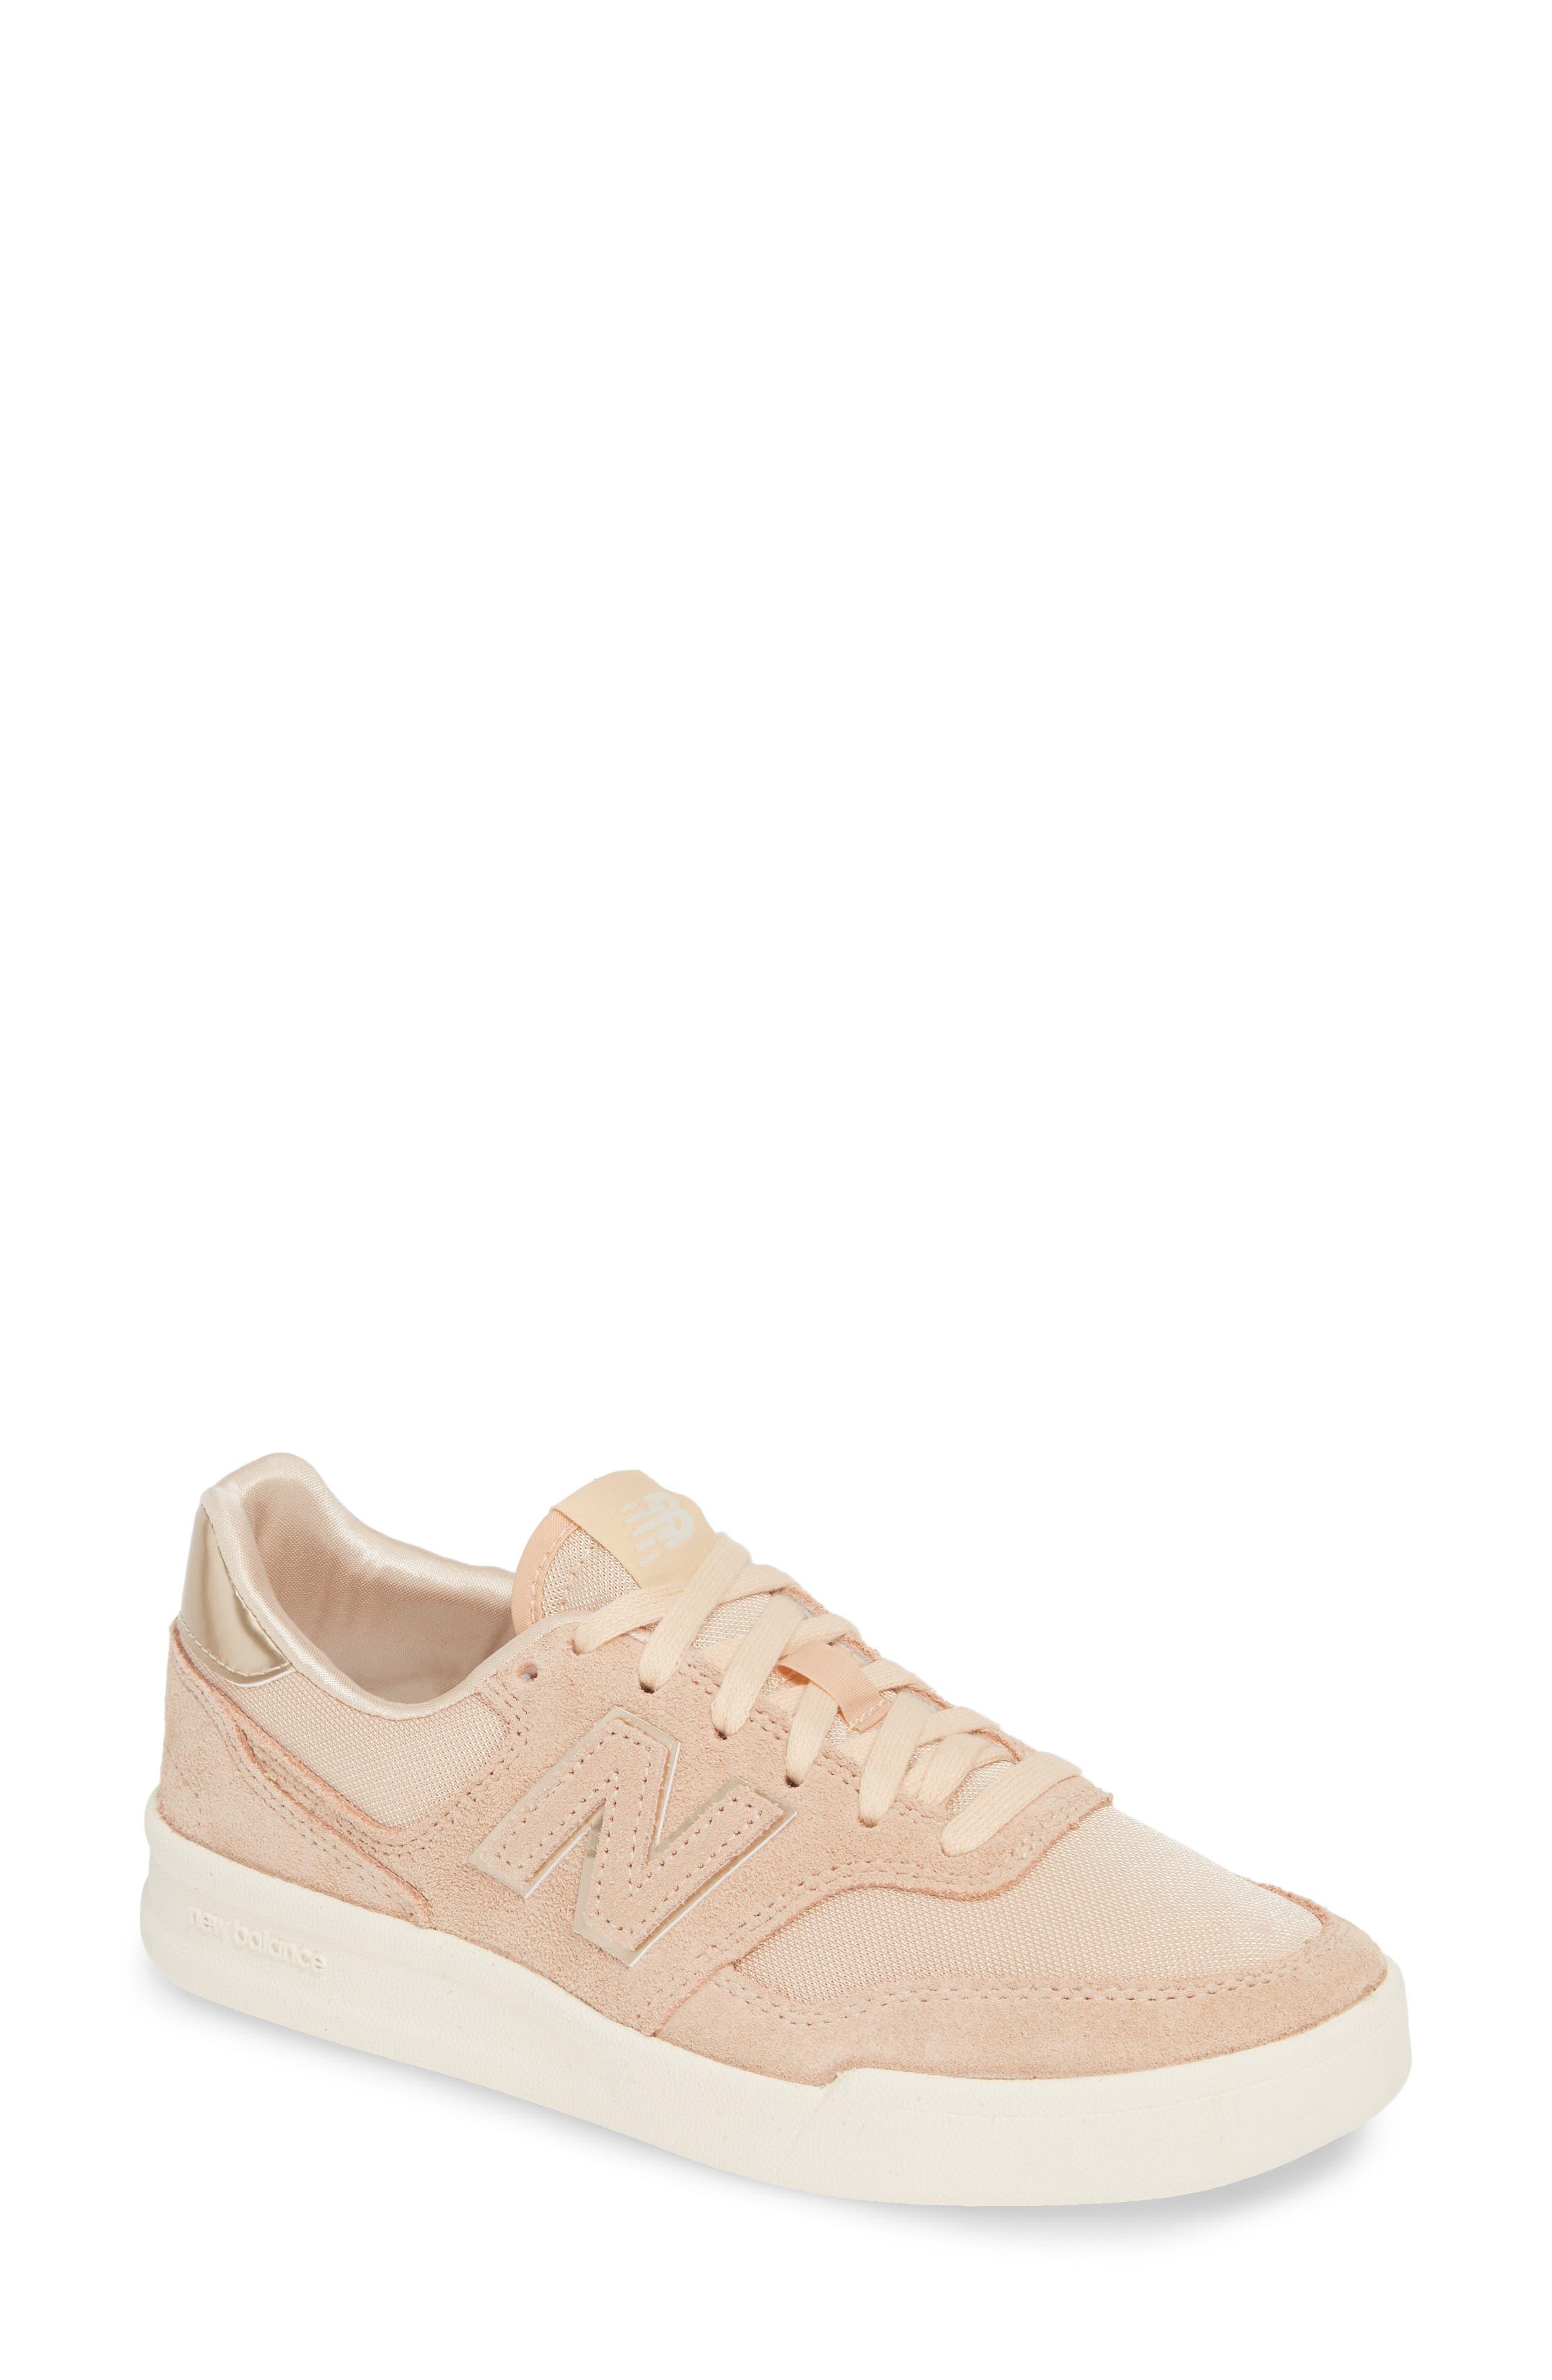 New Balance 300 Sneaker, Pink